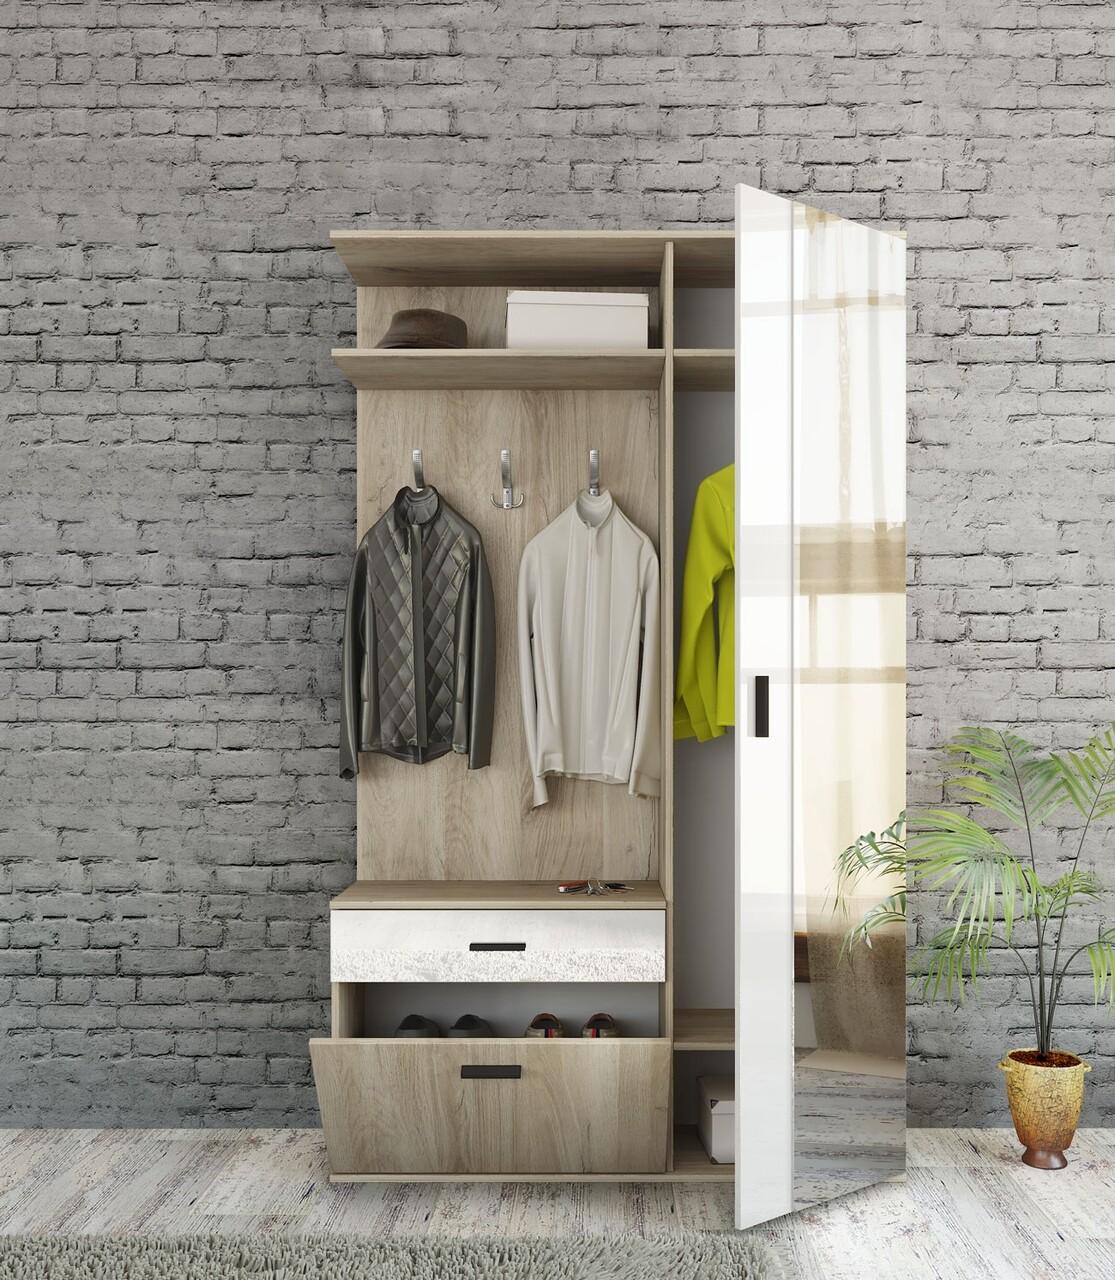 Dulap cu pantofar, cuier si oglinda, Bedora, City 4055, 120 x 35.5 x 199 cm, PAL, stejar/alb